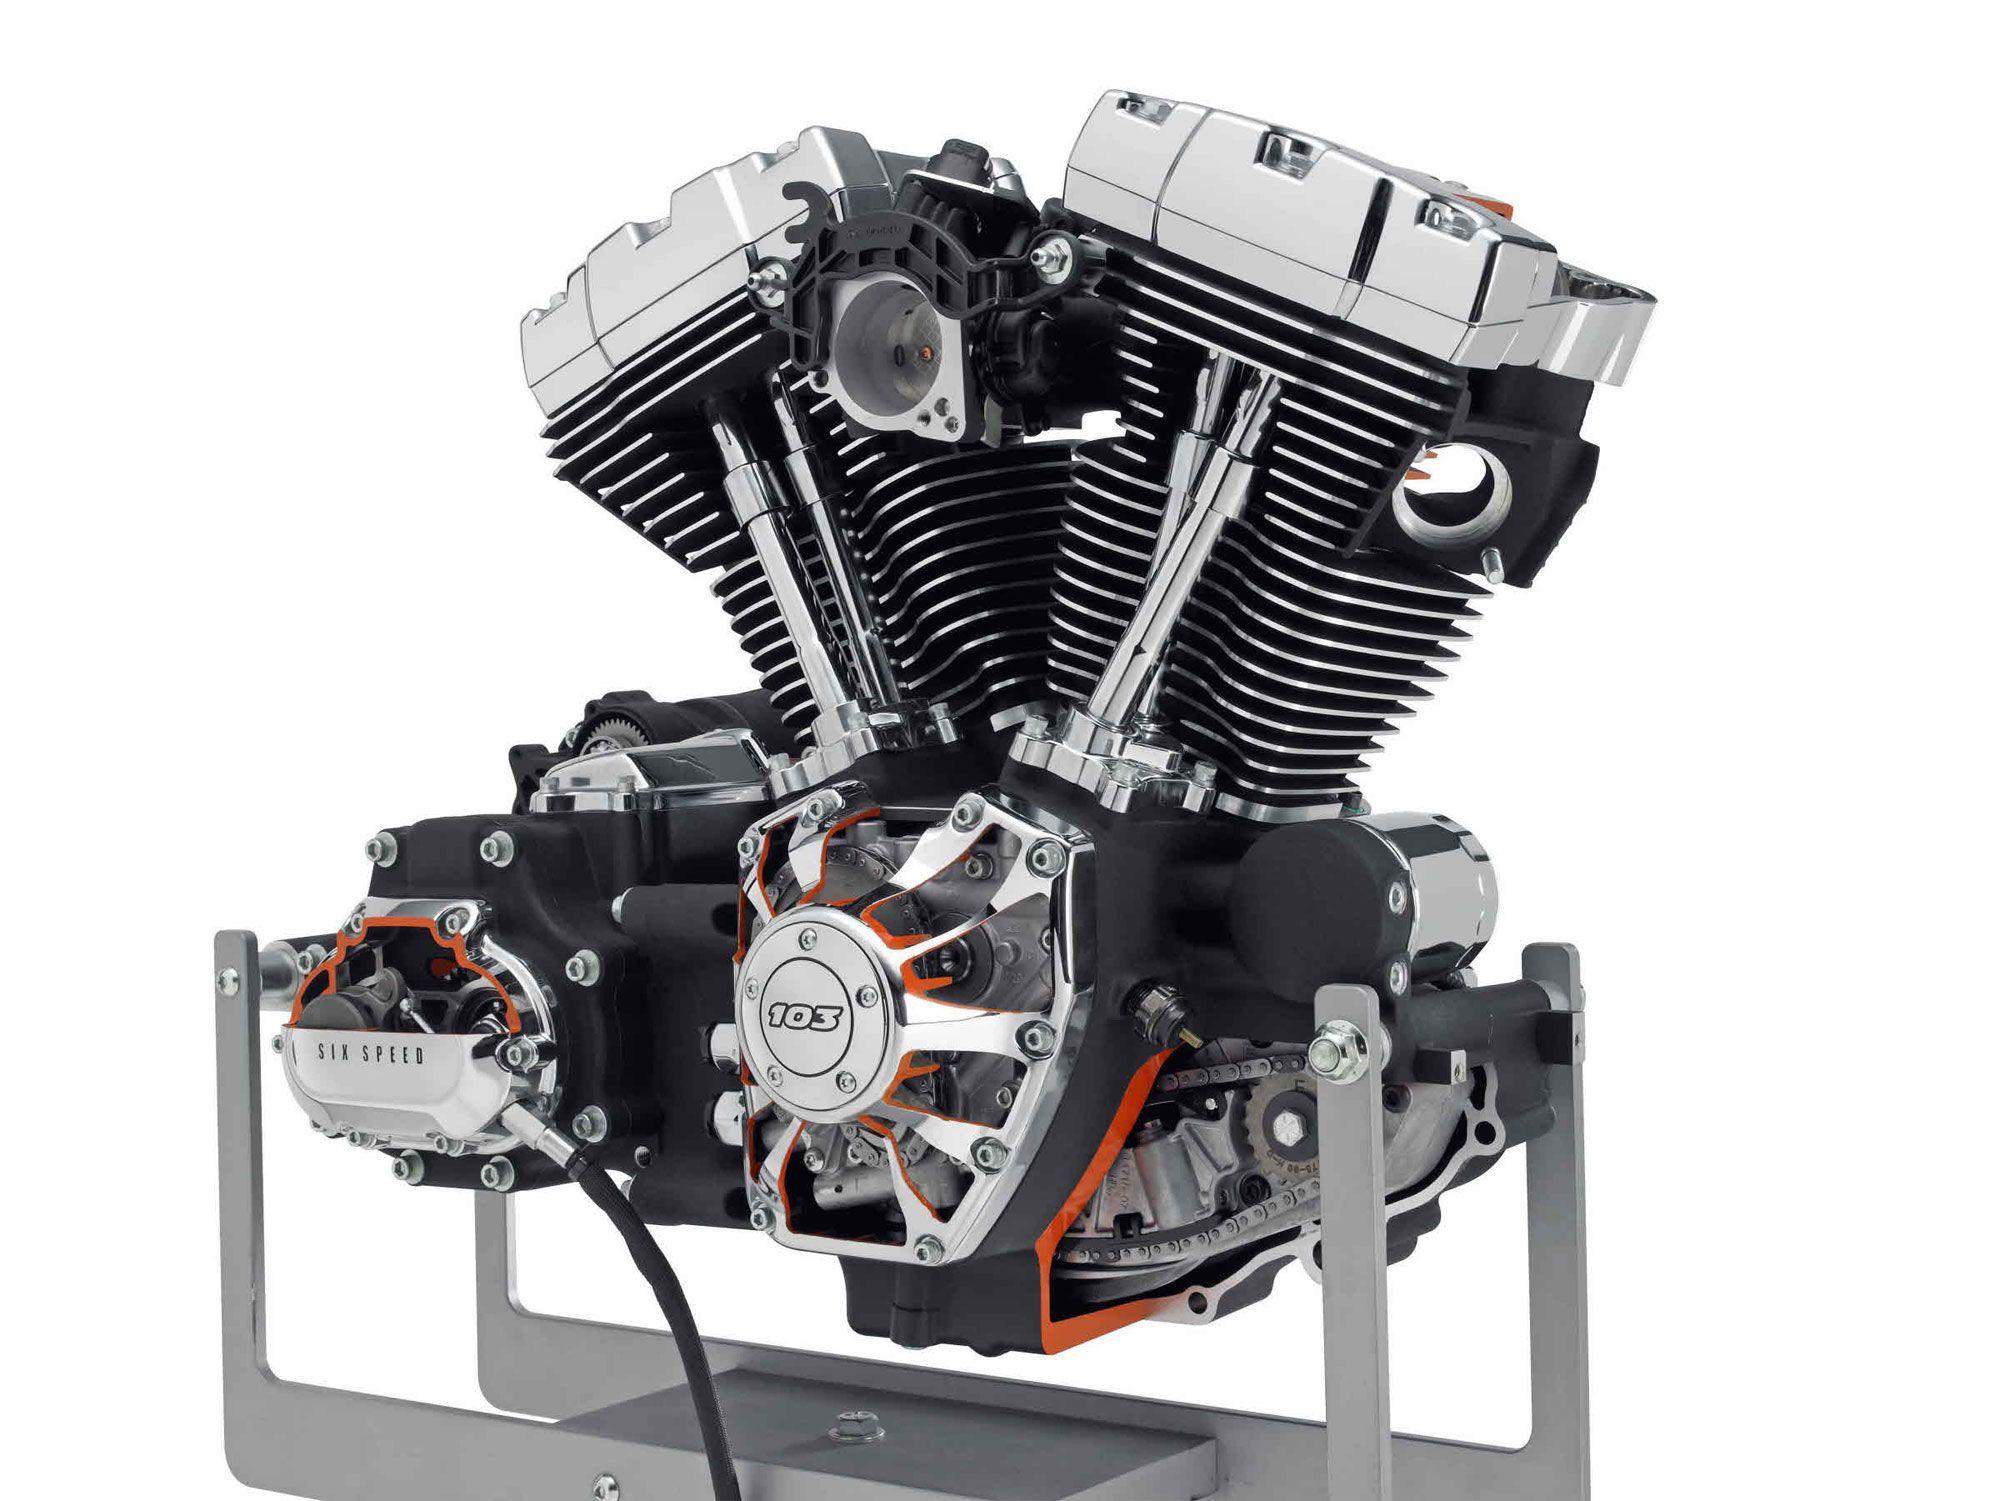 Engine 2016 harley davidson s